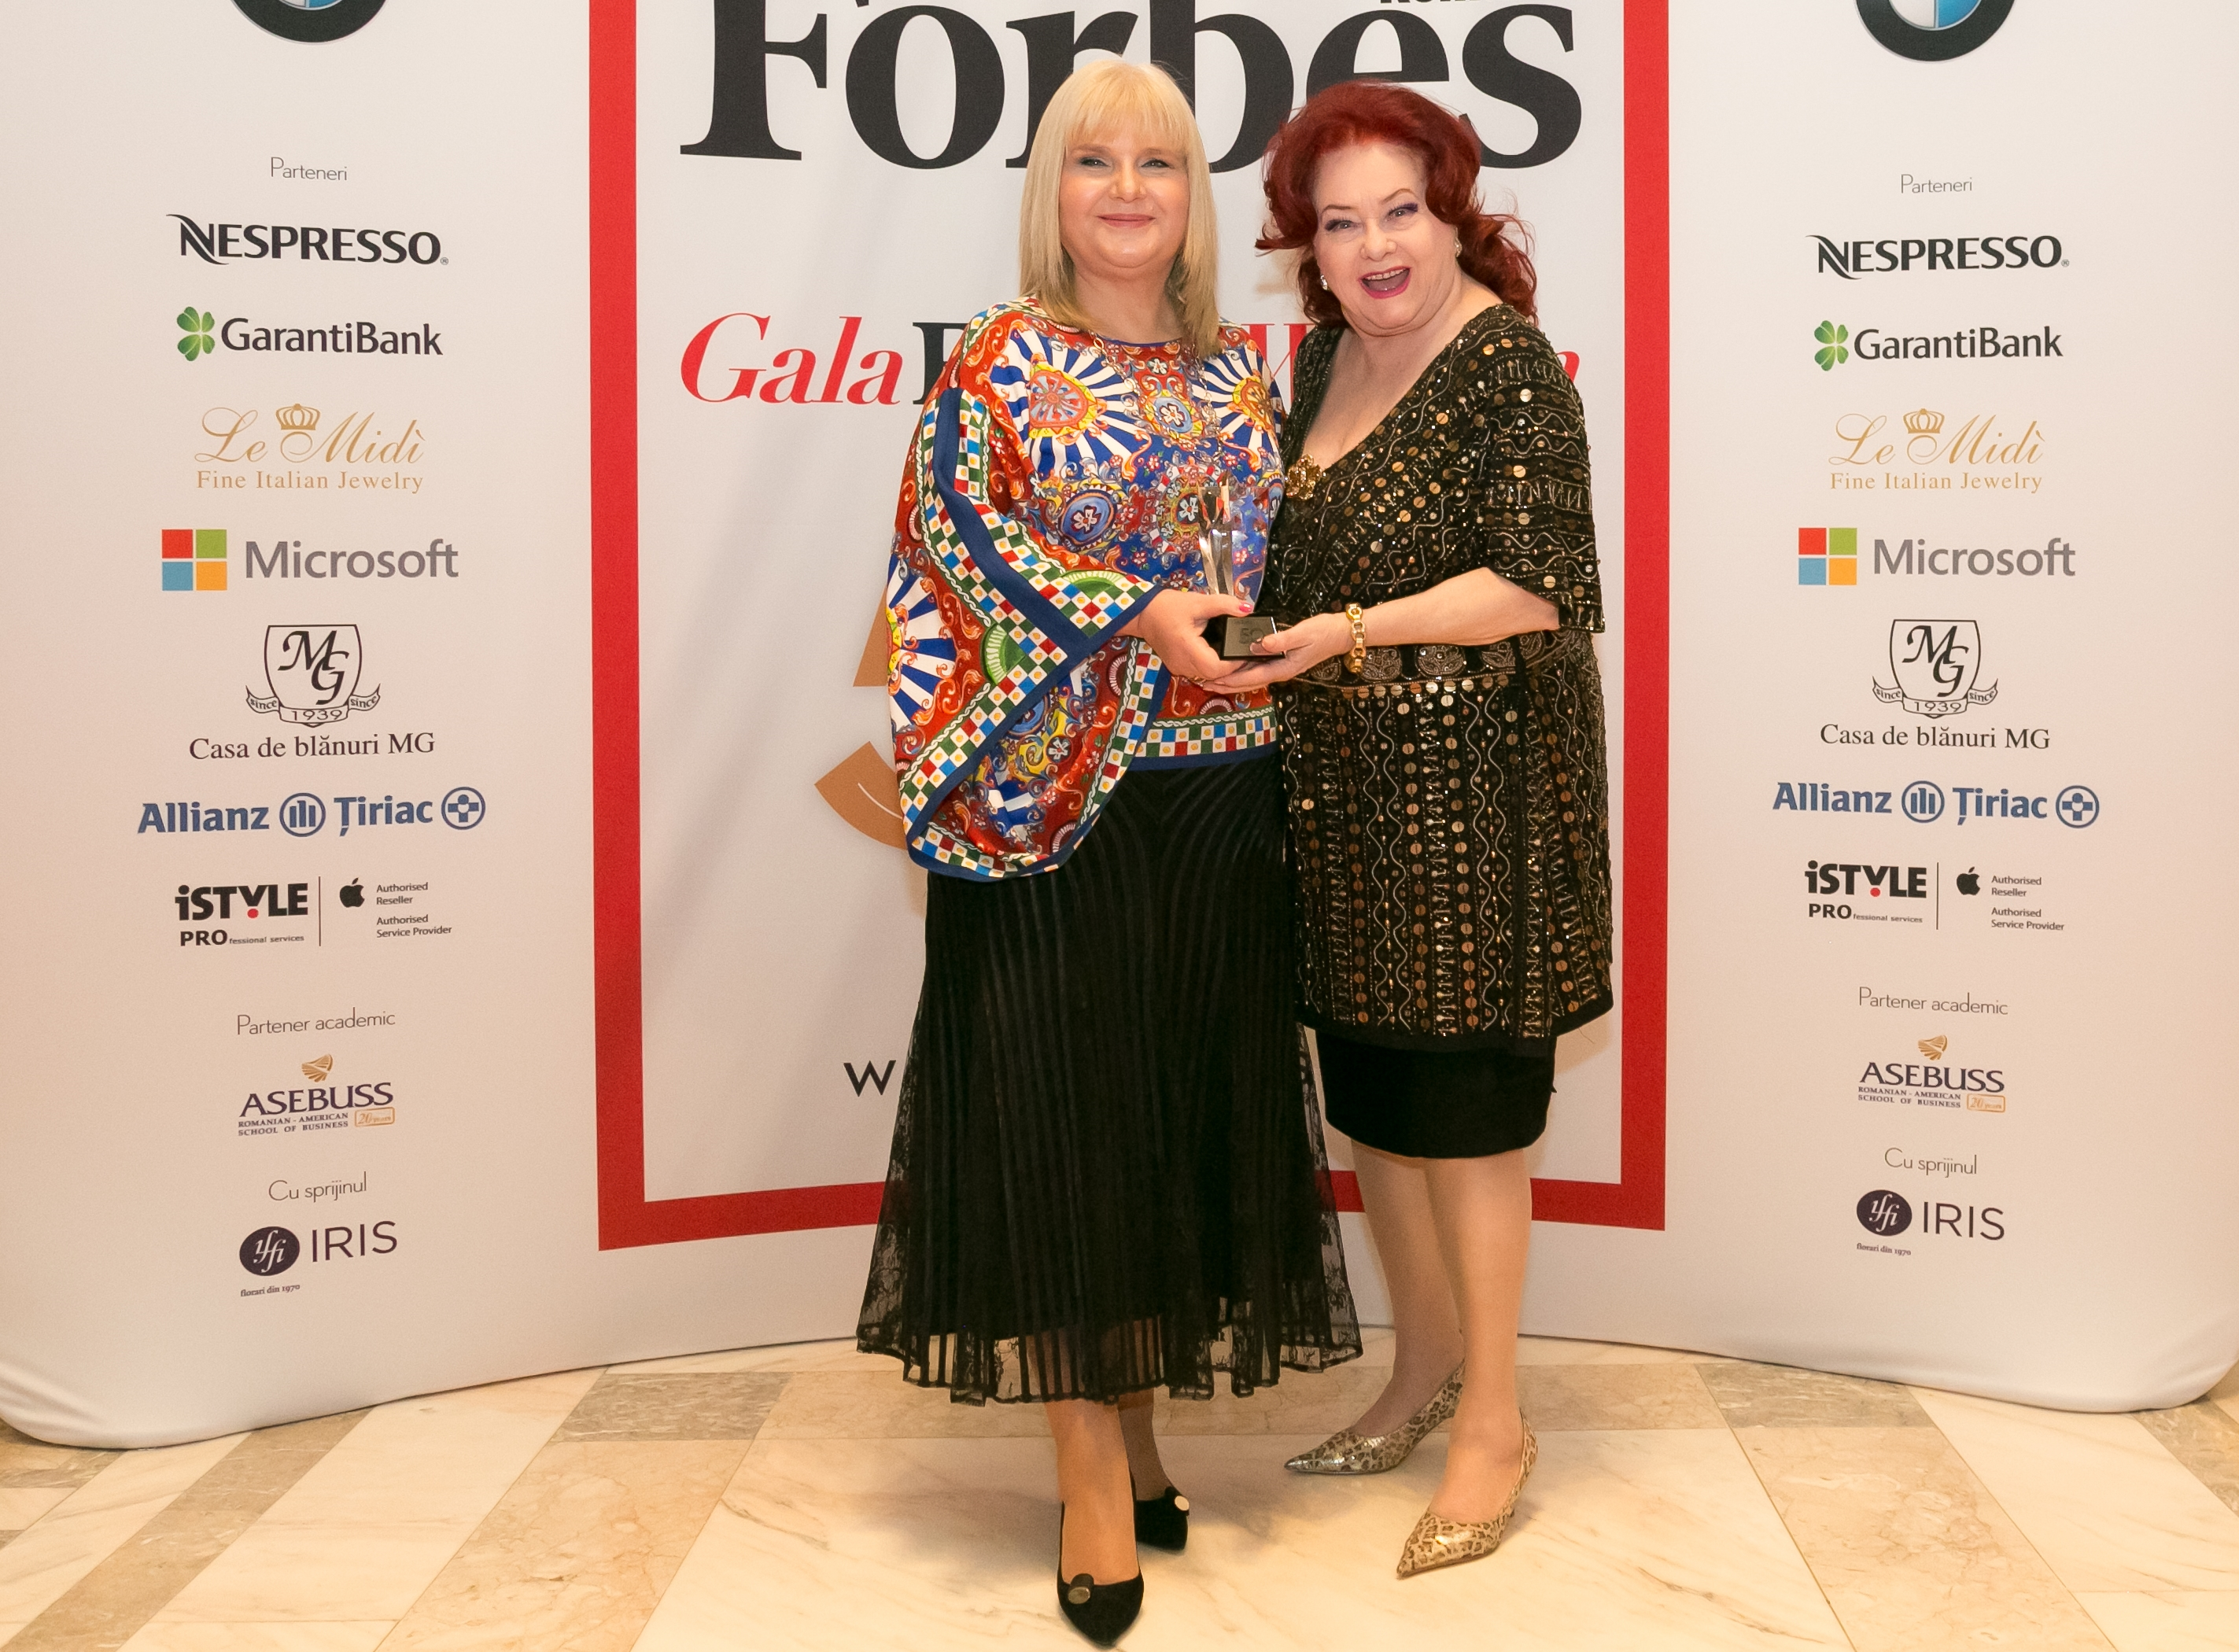 Cele mai influente femei, premiate in cadrul Galei Forbes Woman 2016